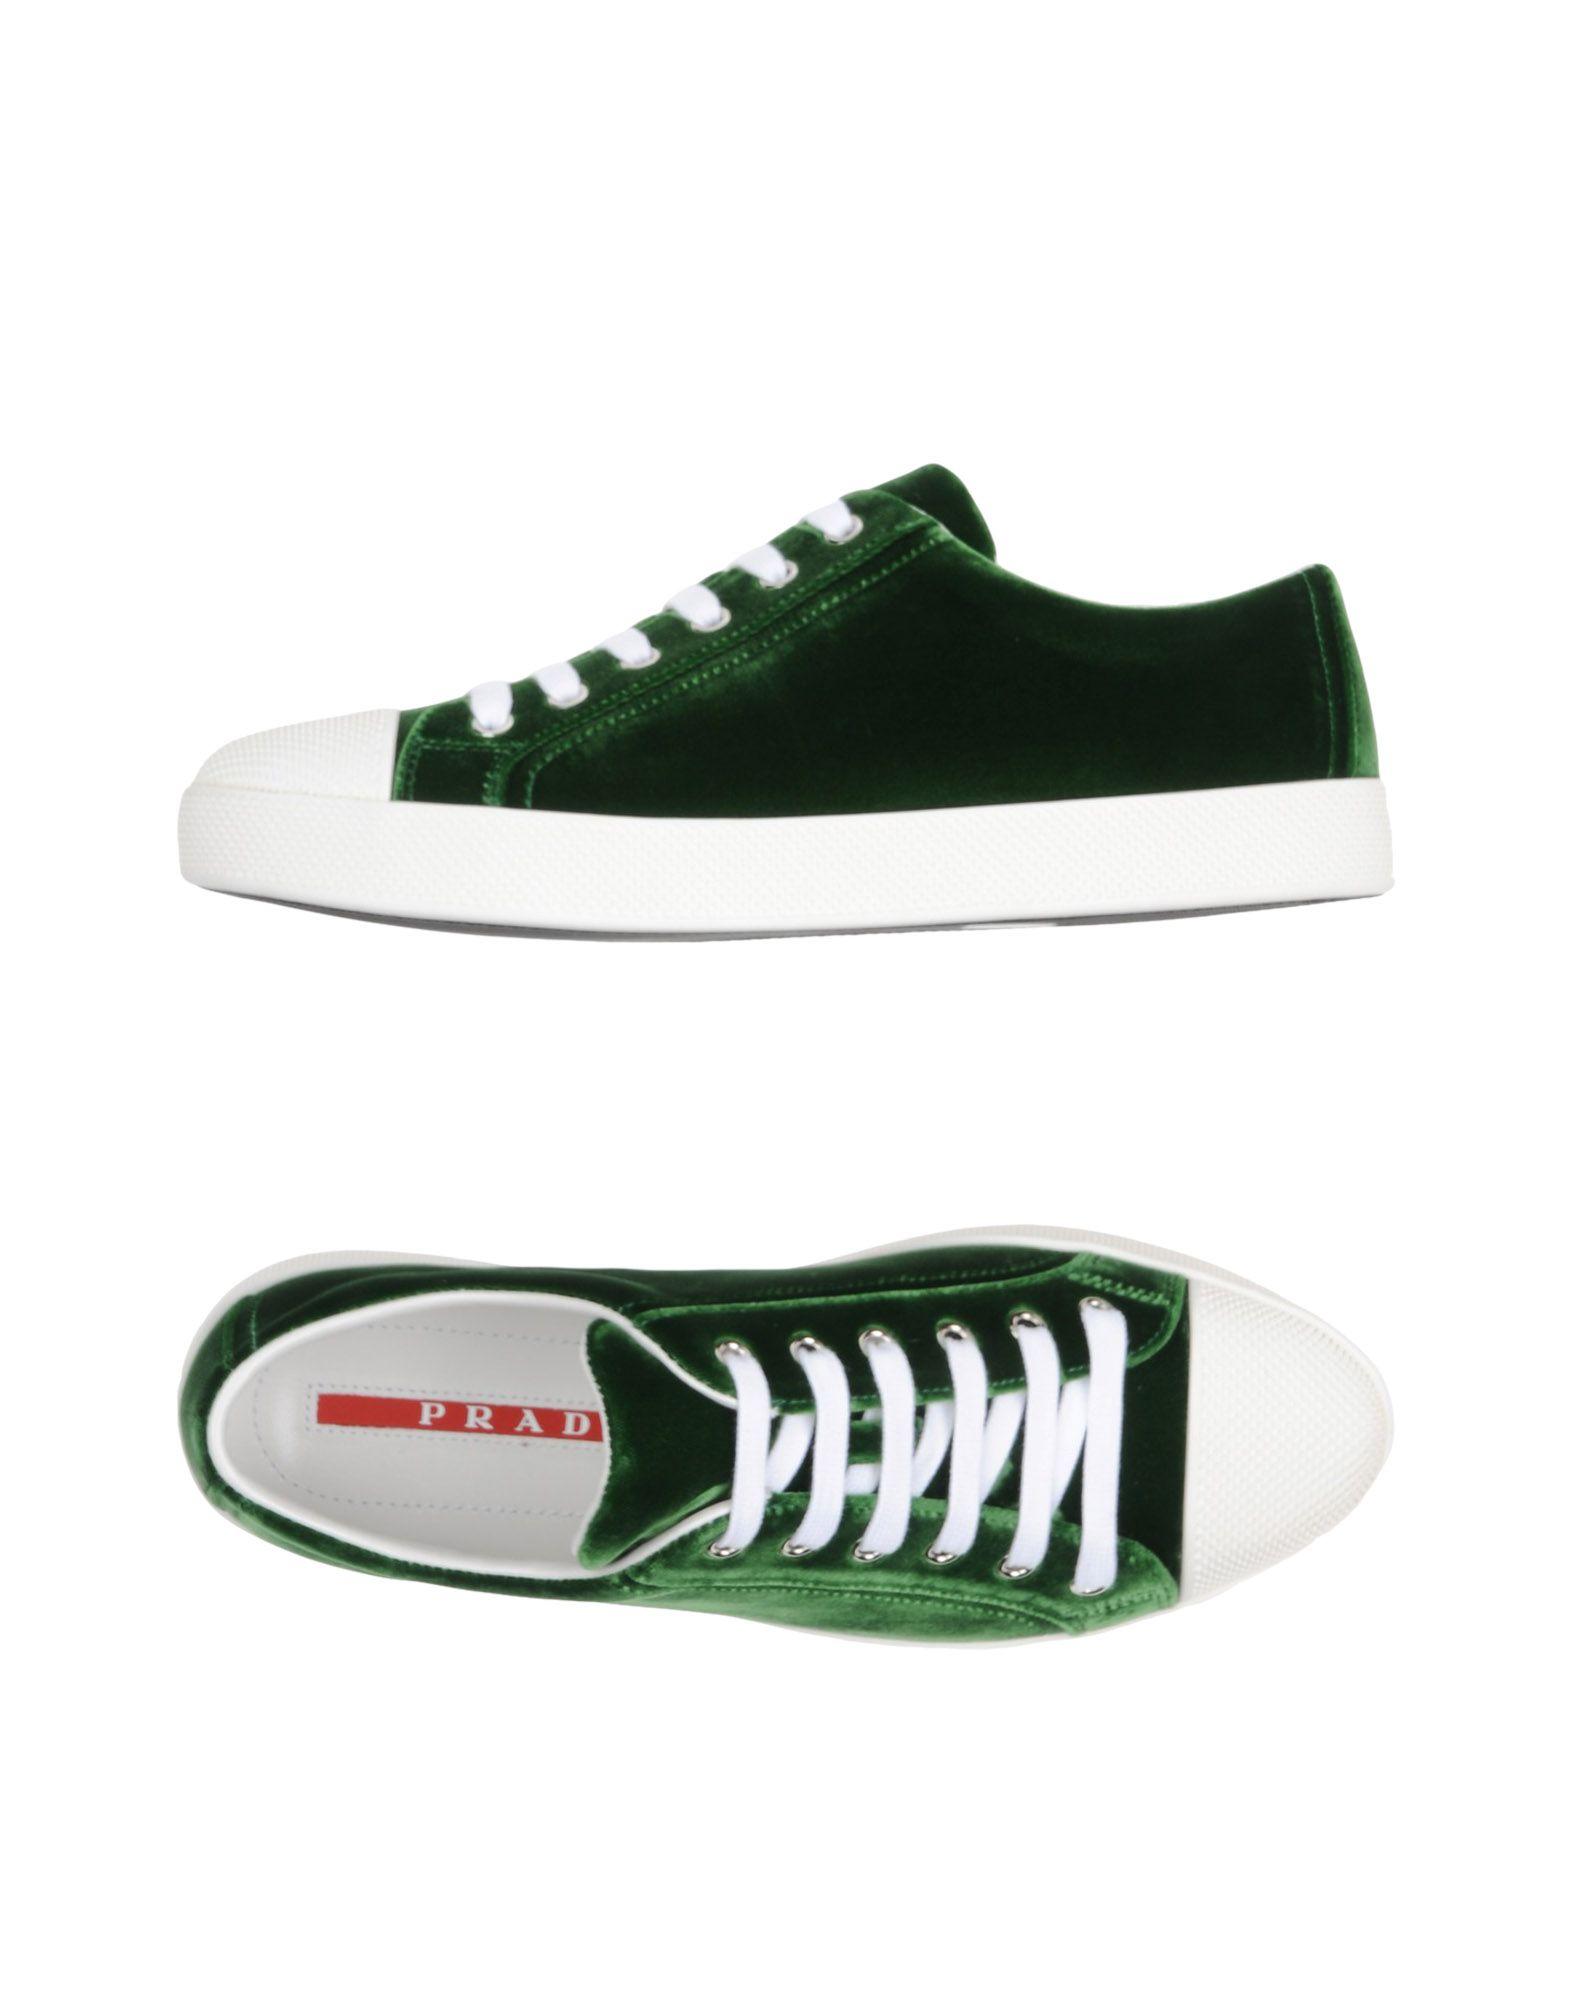 Rabatt Damen Schuhe Prada Sport Sneakers Damen Rabatt  11242140LH dccb32